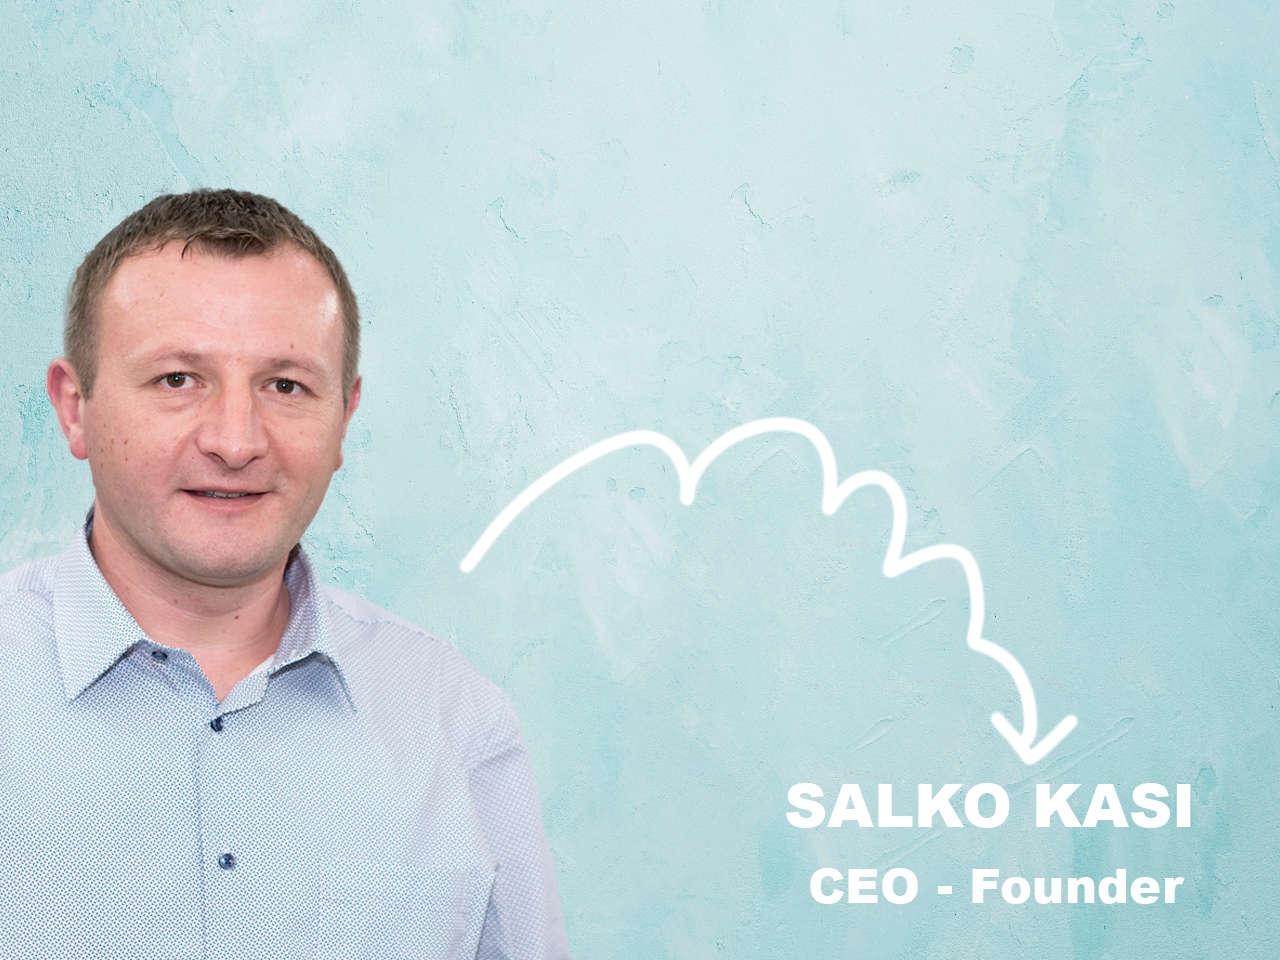 Salko Kasi